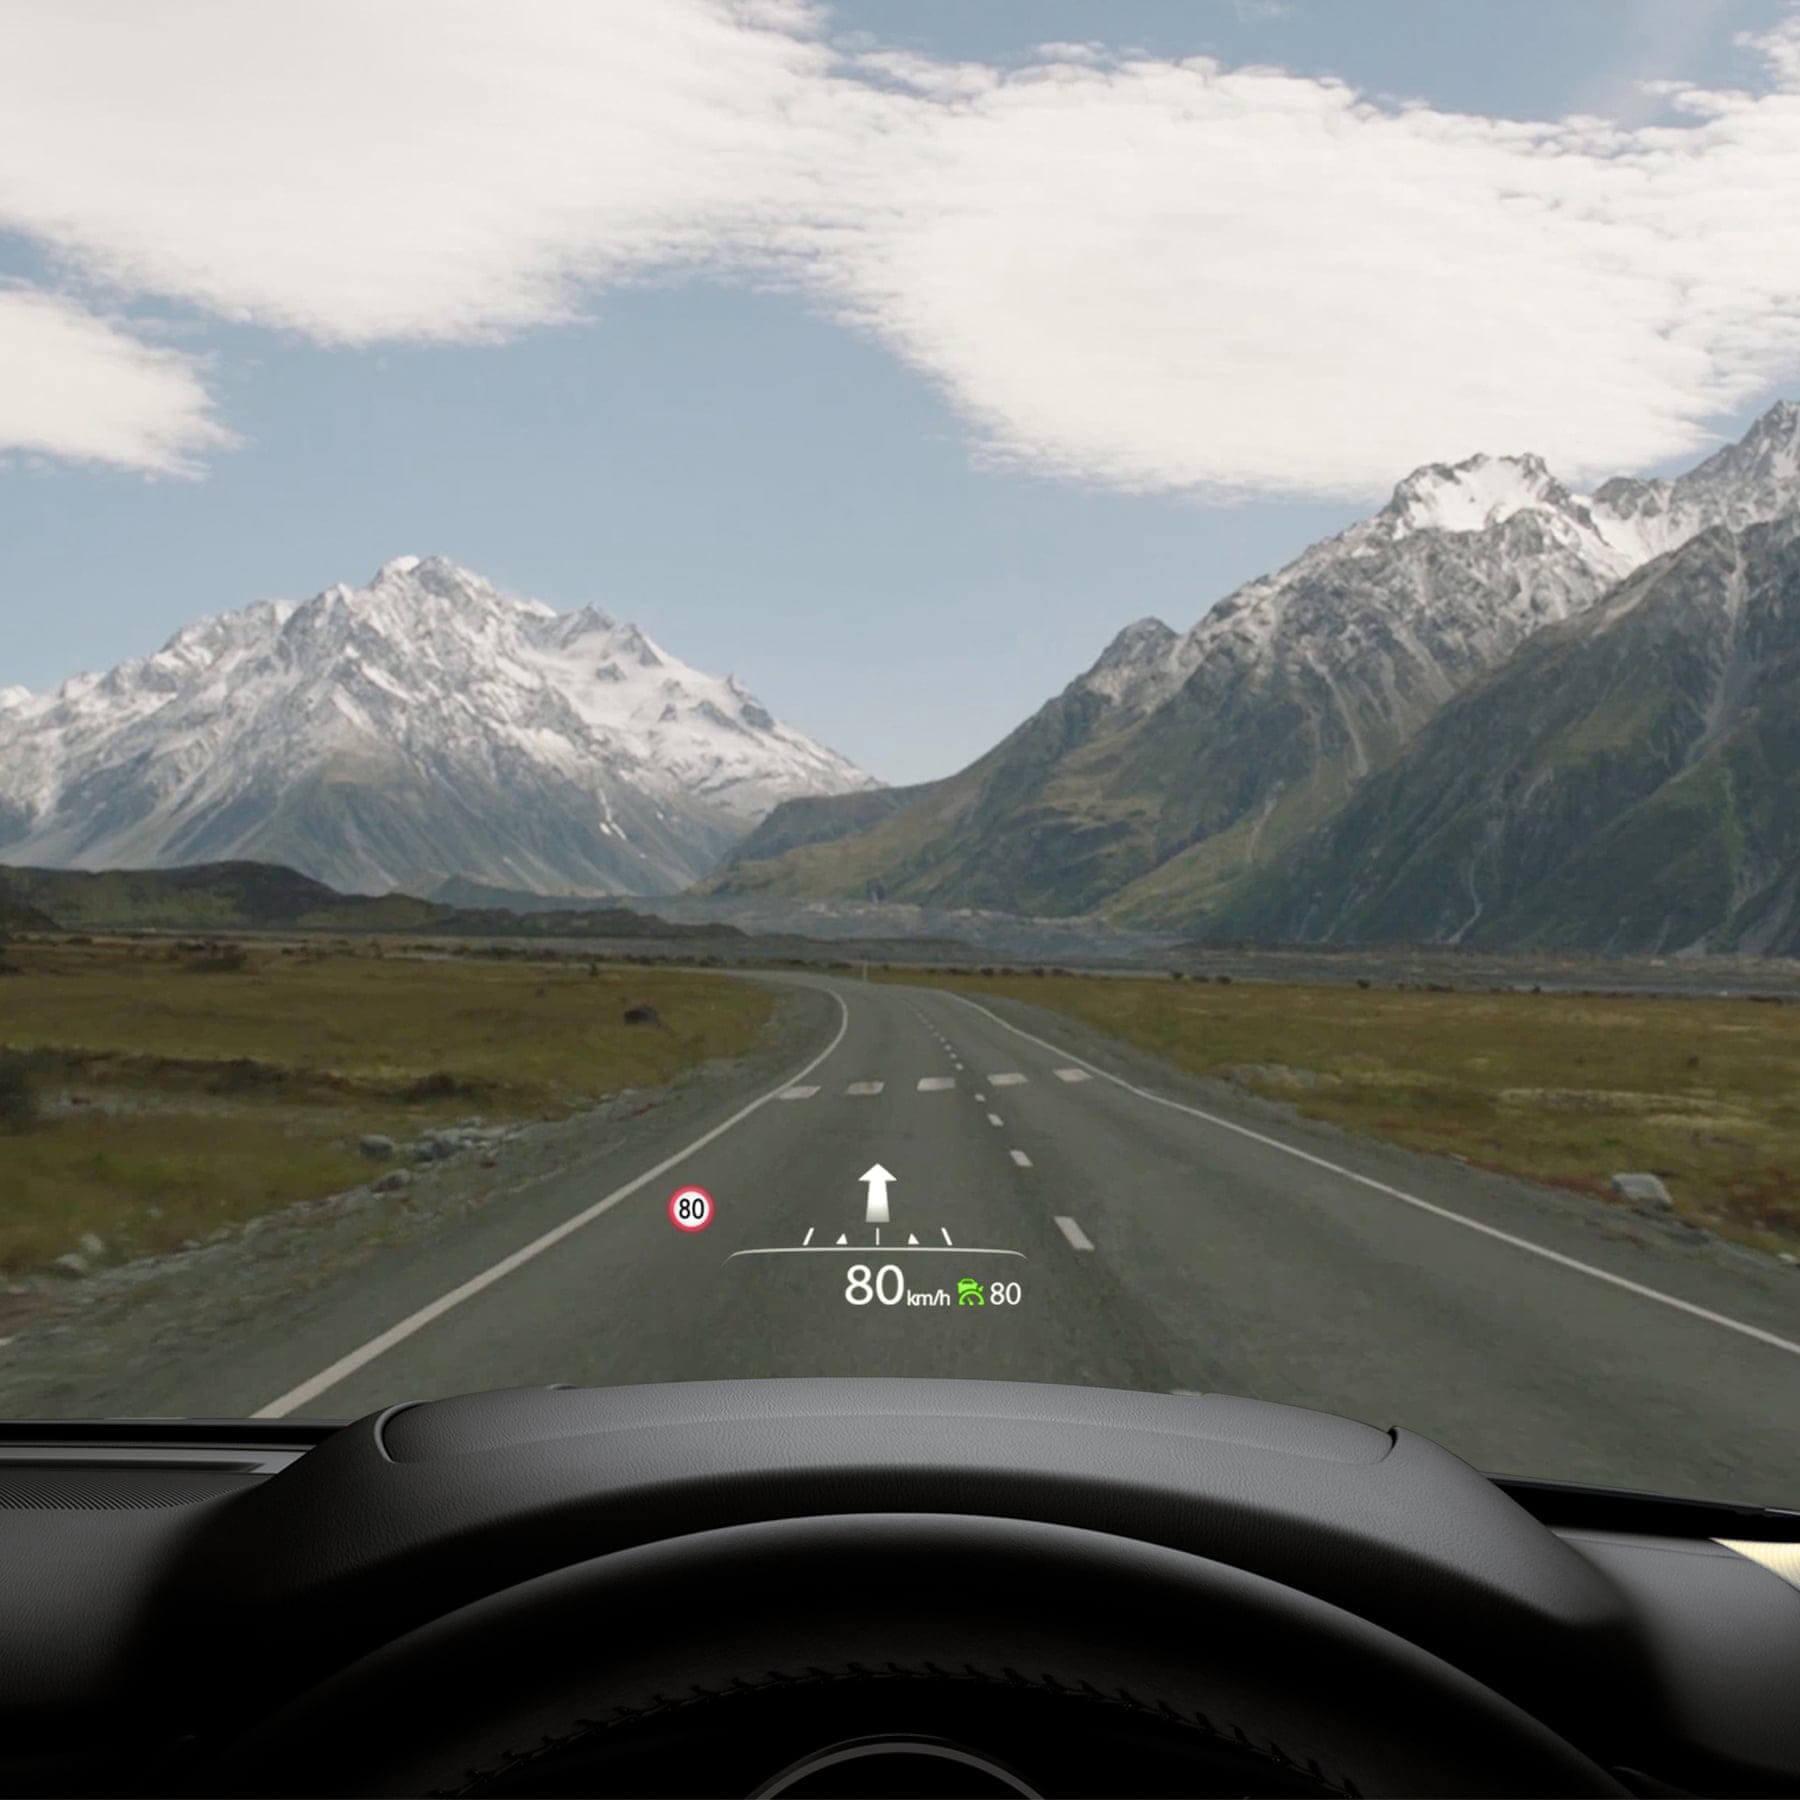 CX-5 ACTIVE DRIVING DISPLAY